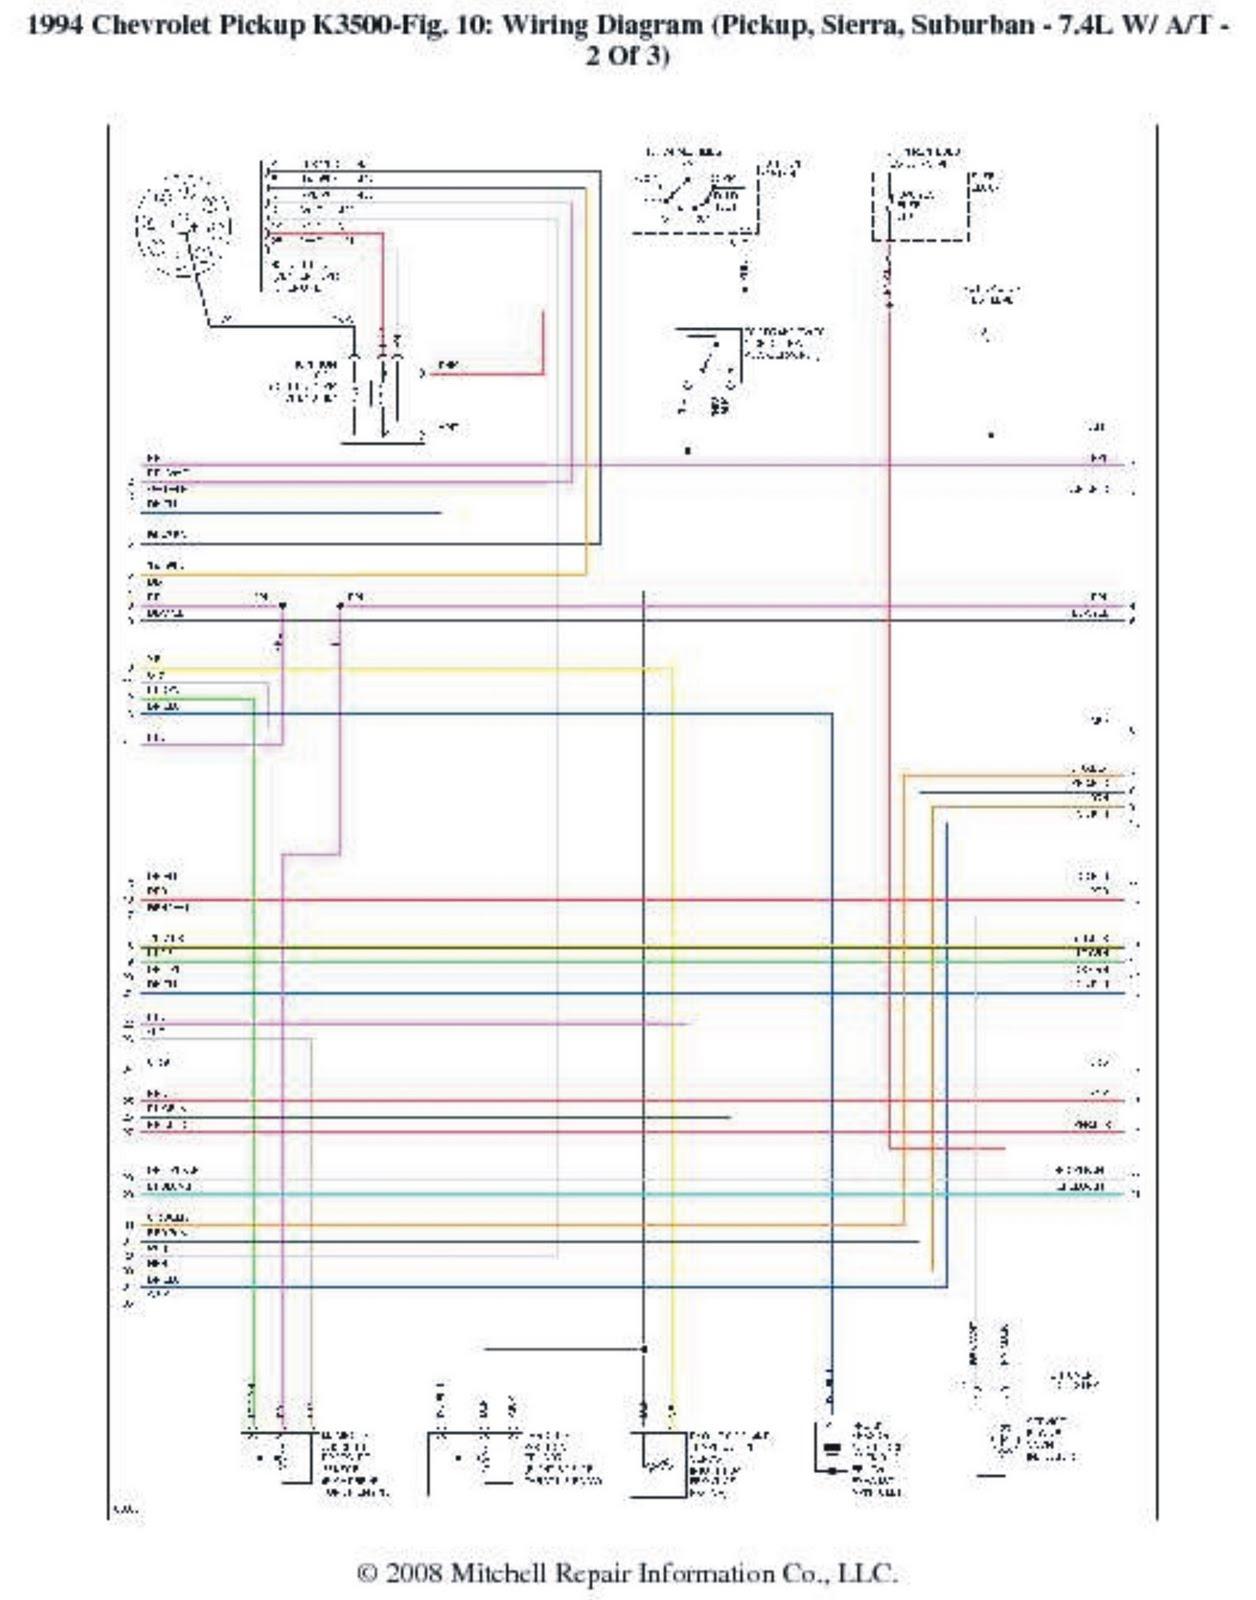 nissan 1400 bakkie ignition wiring diagram images